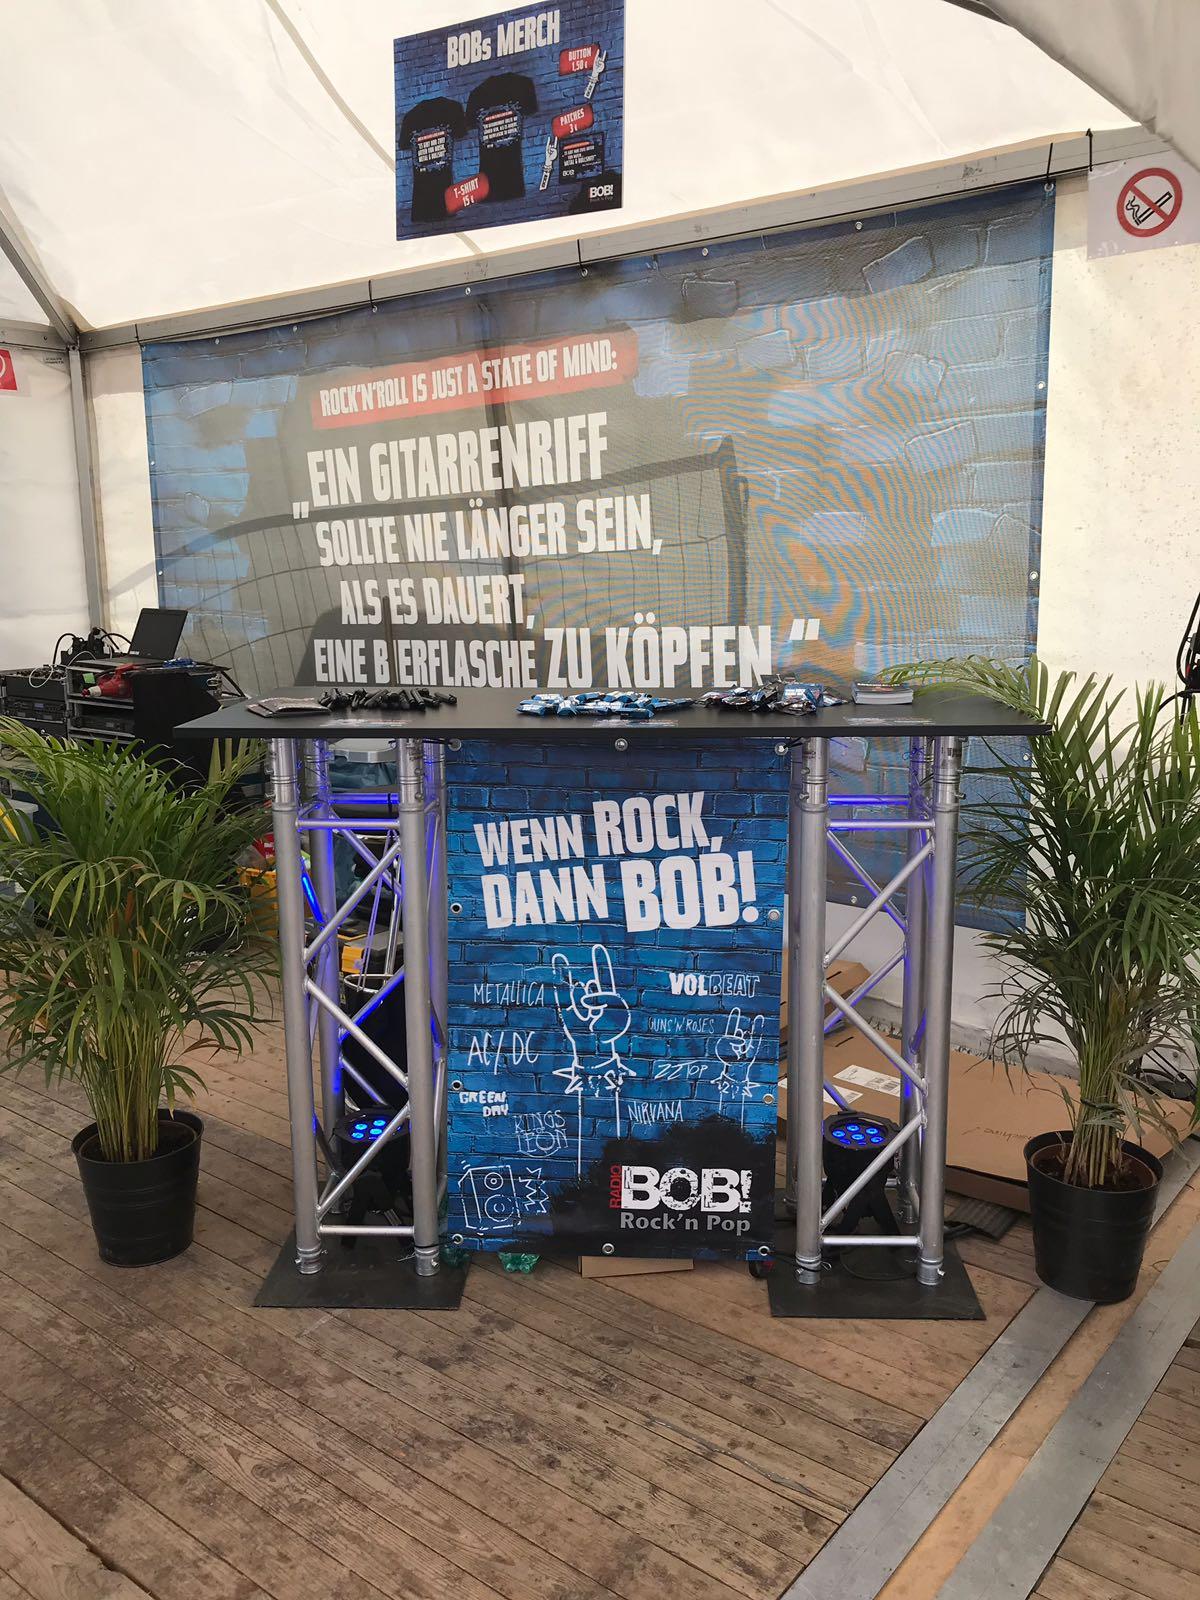 Stadtfeste, Musik, Music, Karaoke, Veranstaltungsorganisation, Eventorganisation, Organisation, even